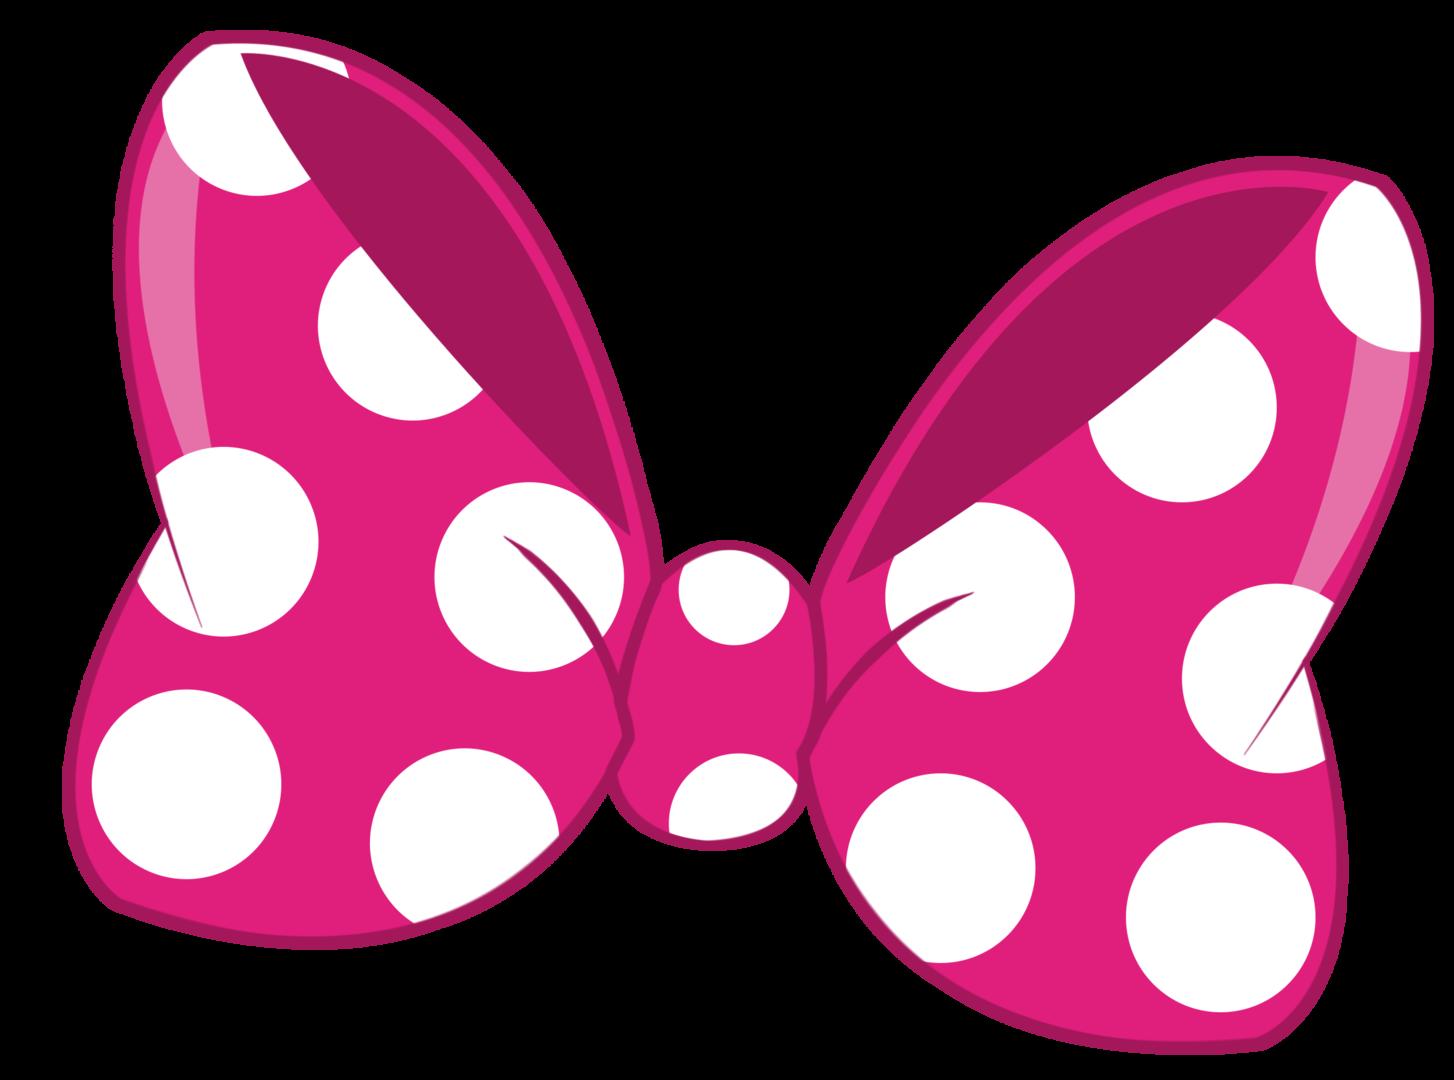 Pin By Marina On Mickey E Minnie Iii Minnie Mouse Ribbon Minnie Minnie Mouse Bow